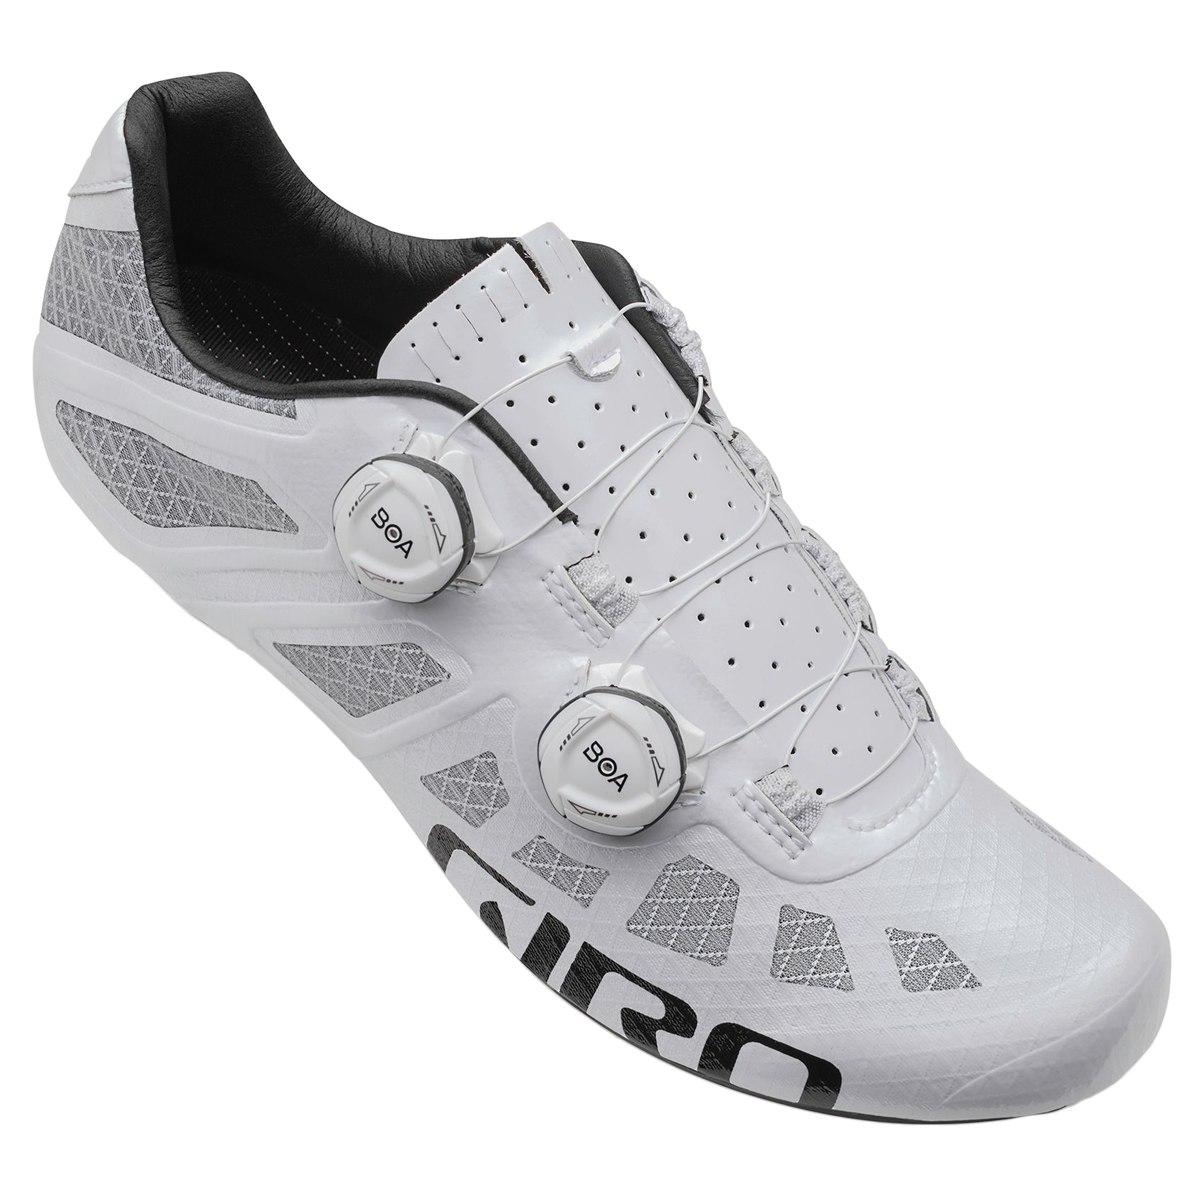 Giro Imperial Rennradschuh - white